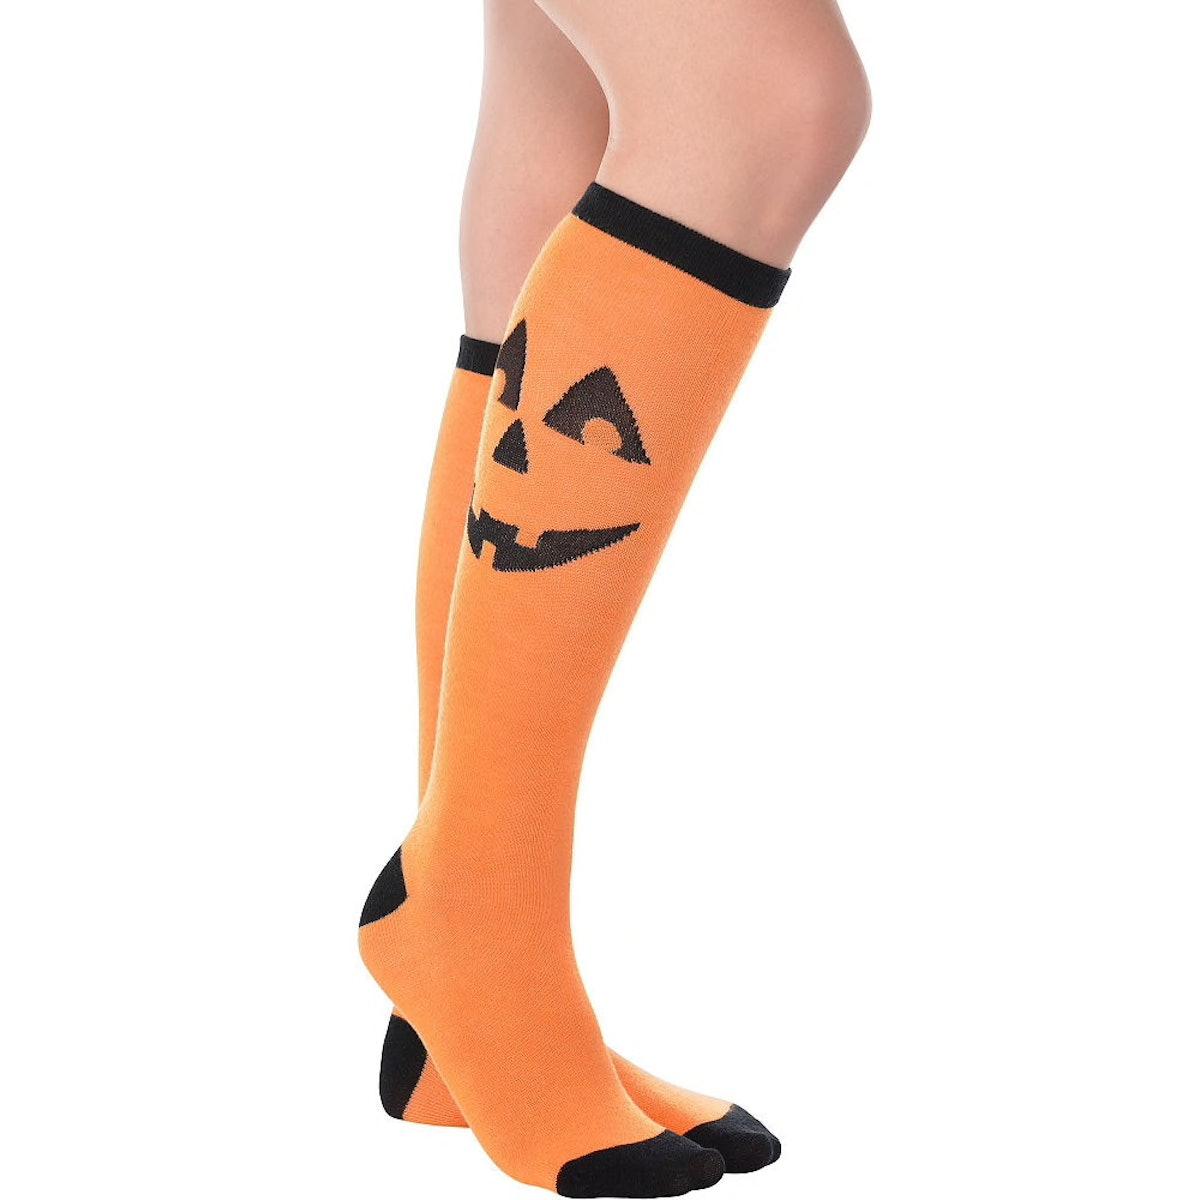 Jack-o'-Lantern Knee-High Socks